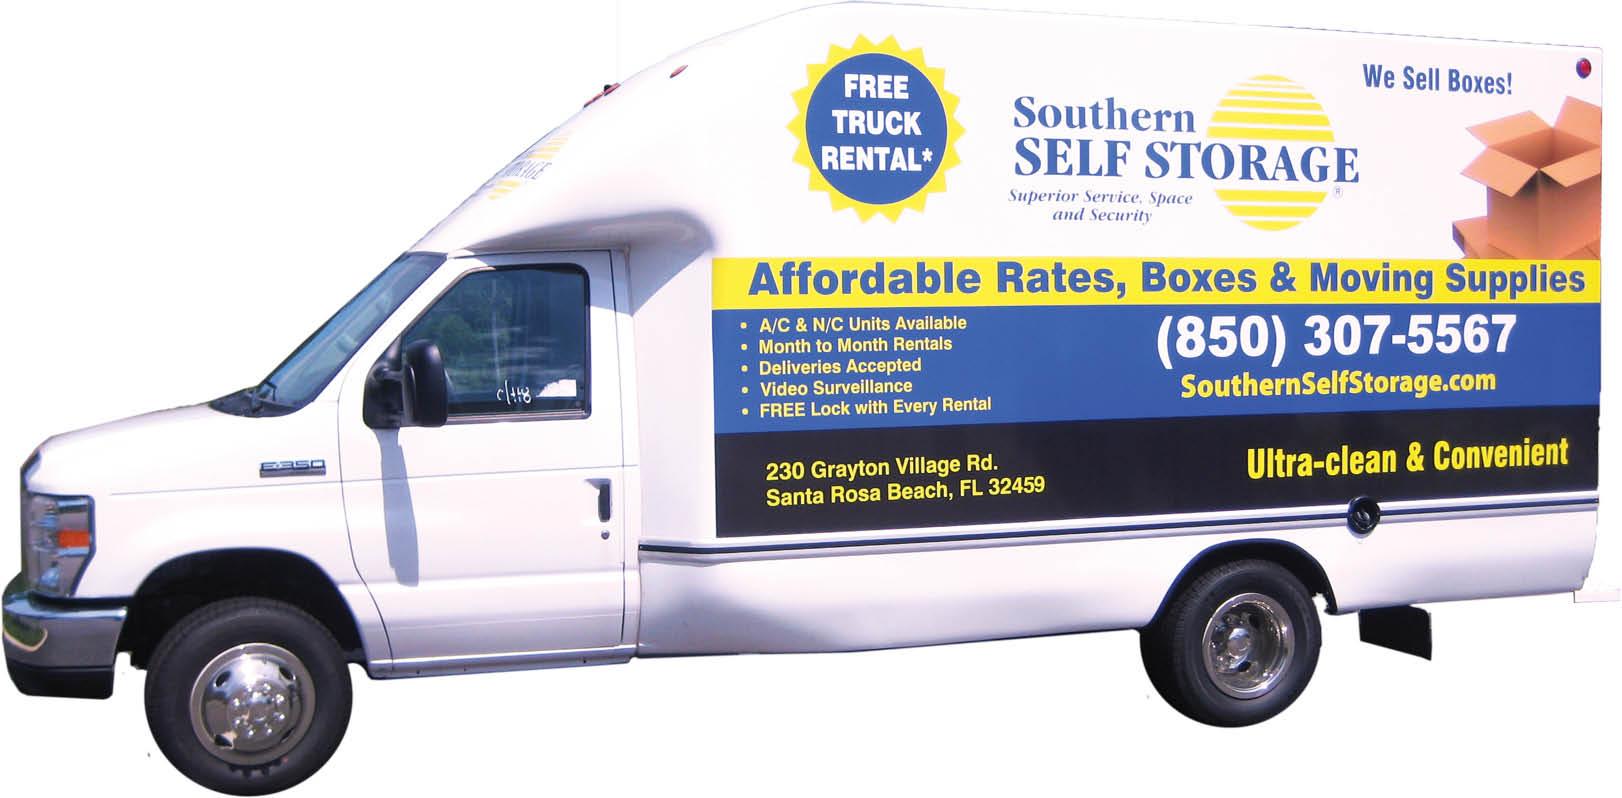 Southern Self Storage company vehicle logo